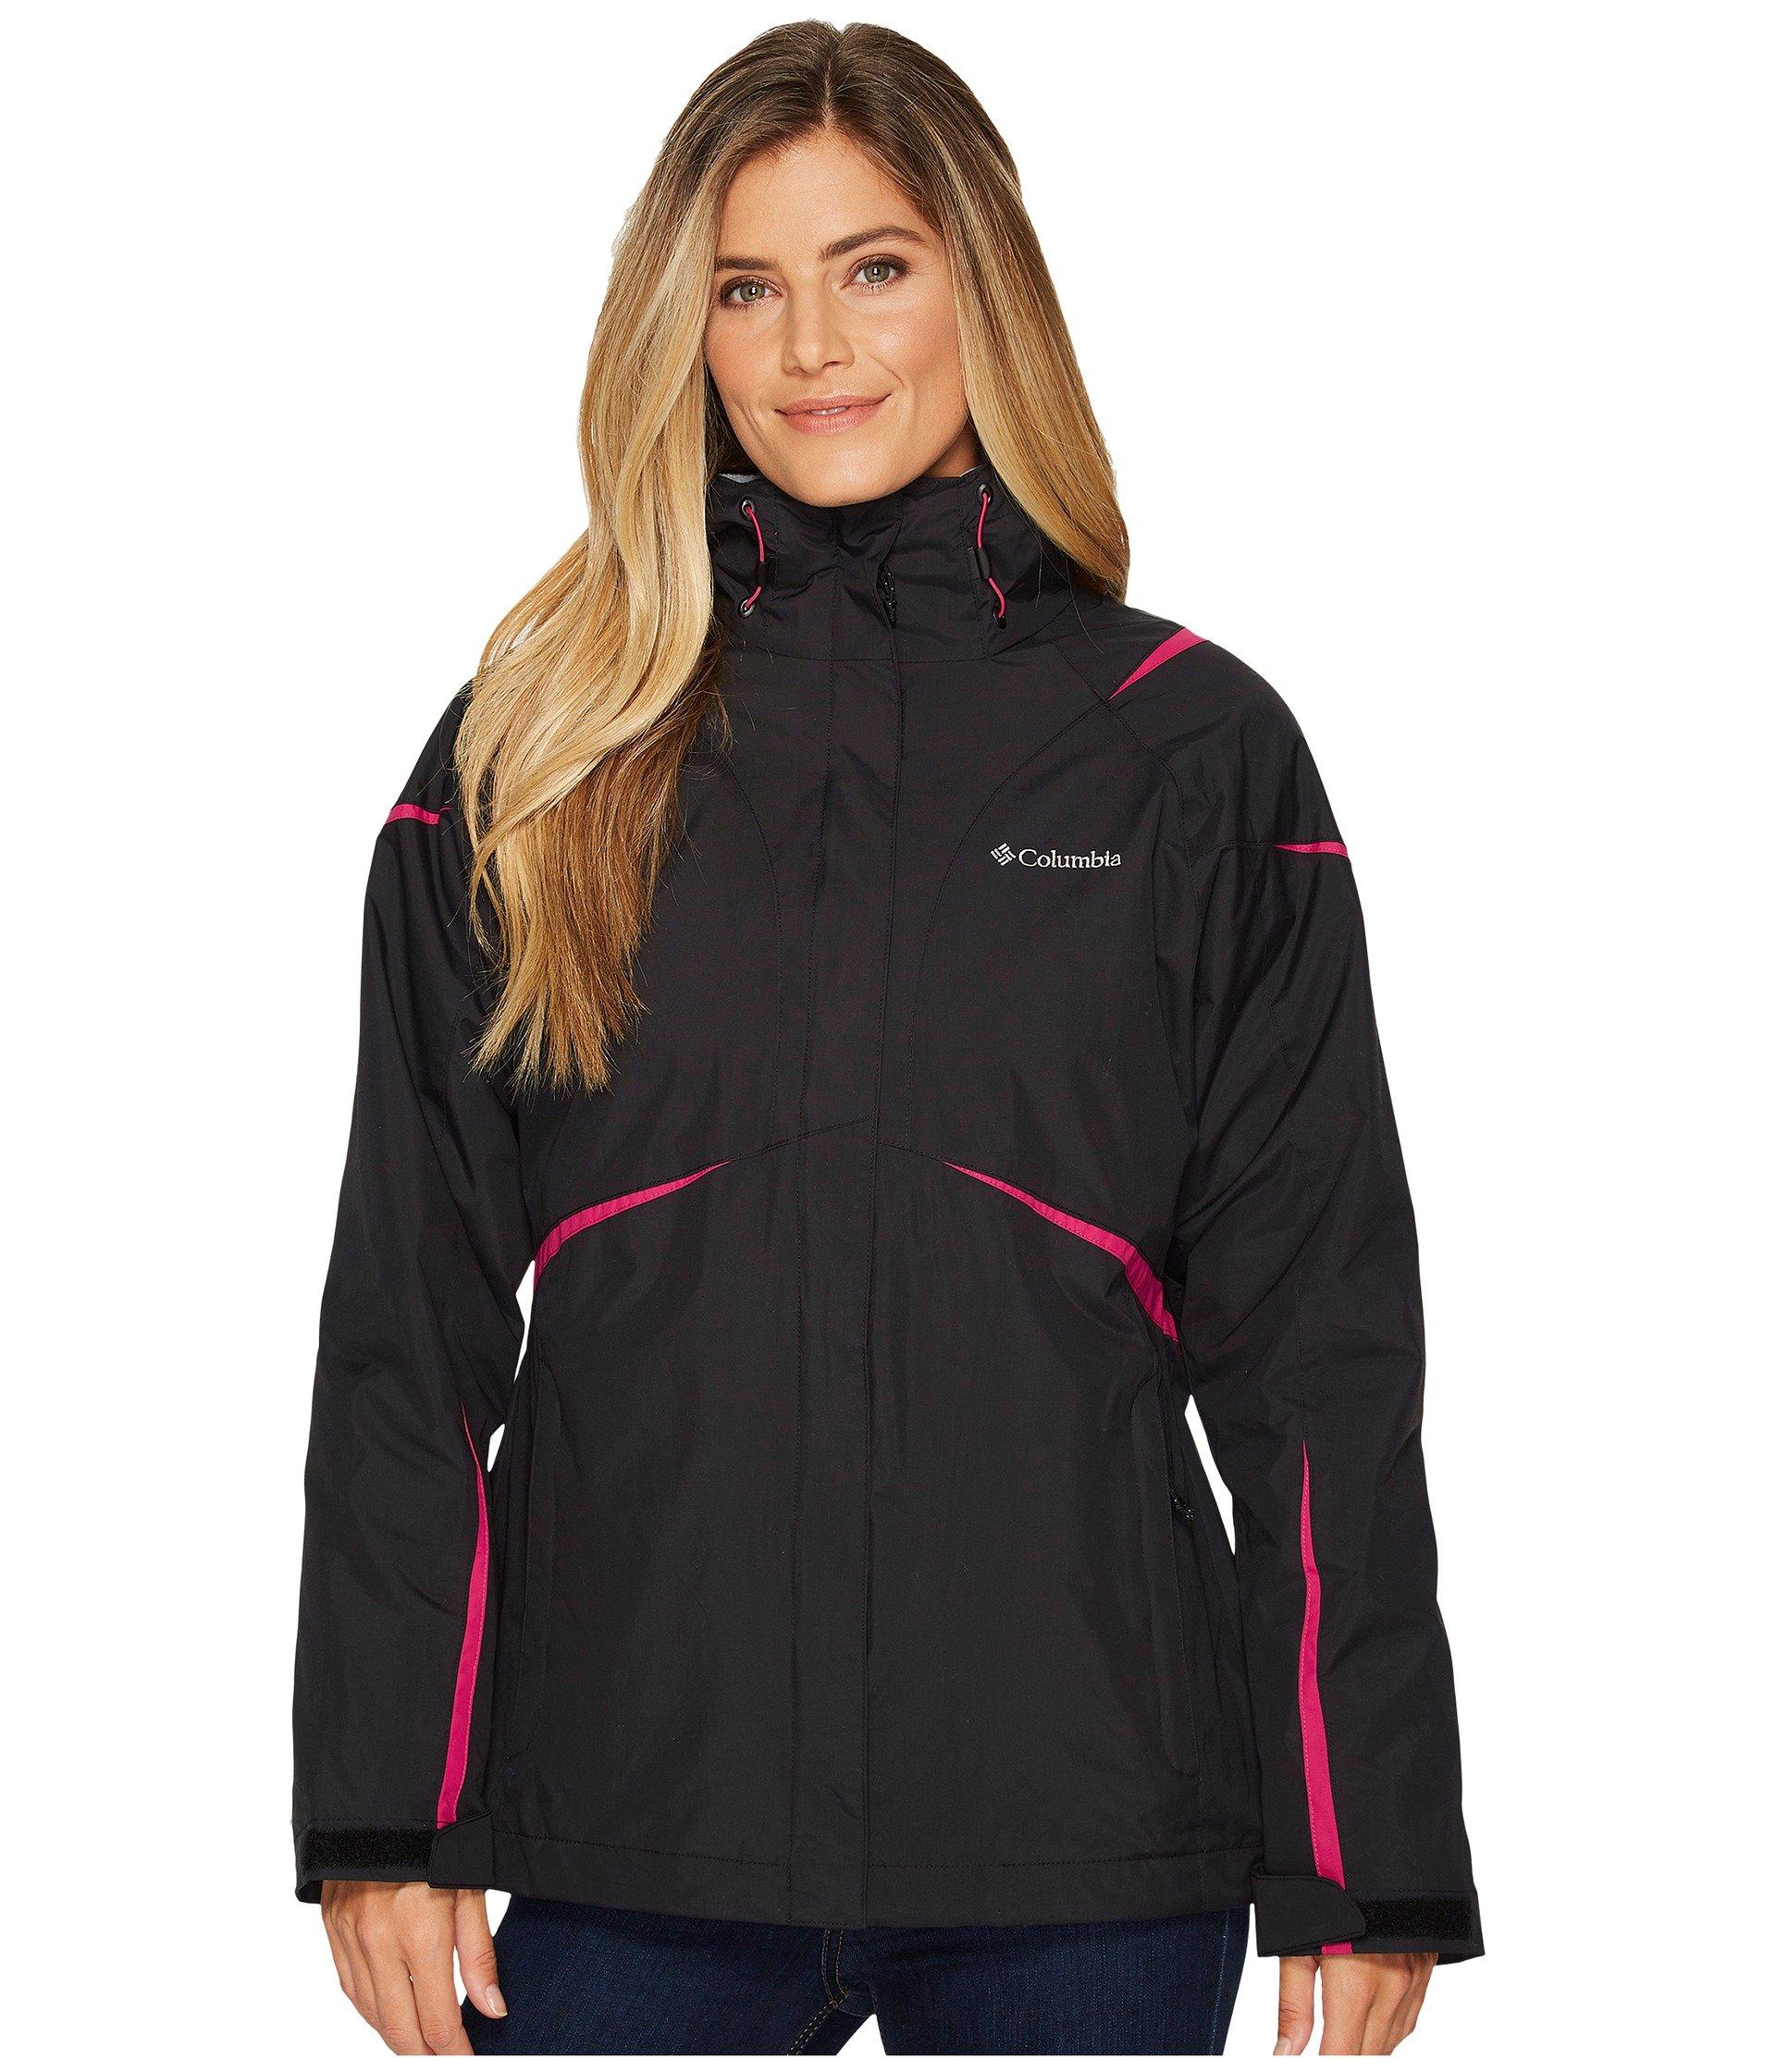 COLUMBIA Blazing Star Interchange Jacket, Black/Deep Blush